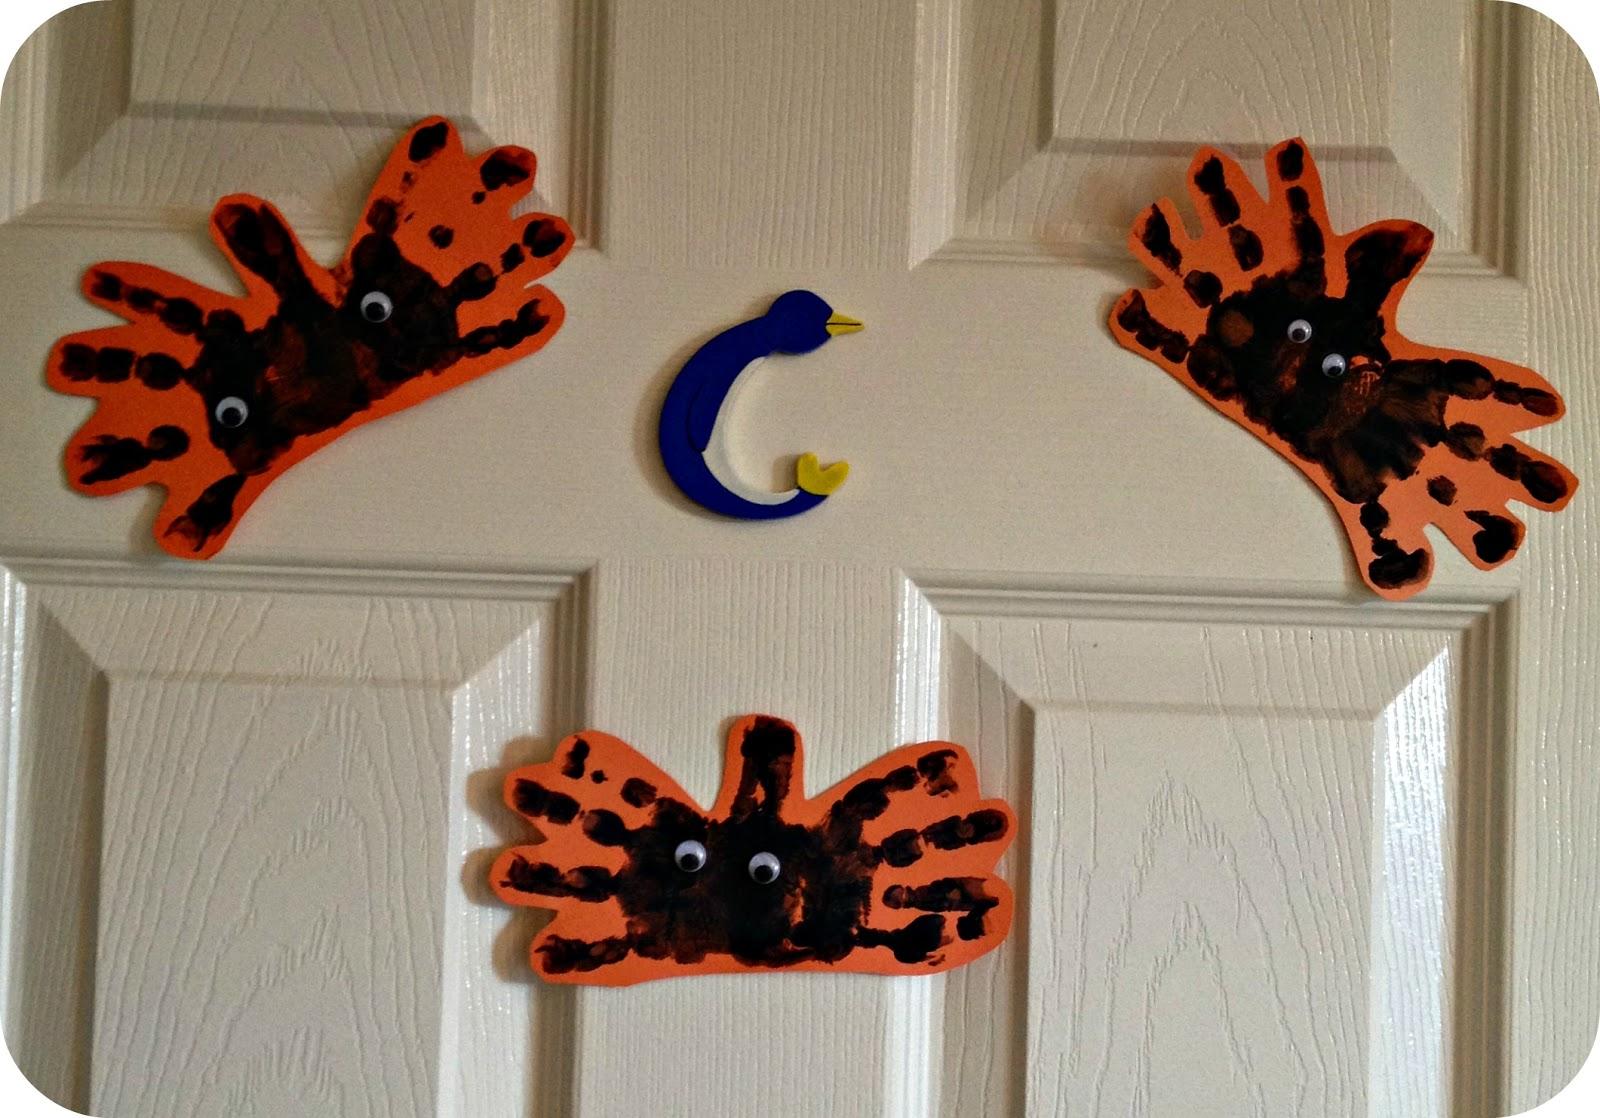 Transatlantic Blonde: Easy Halloween Crafts for Toddlers